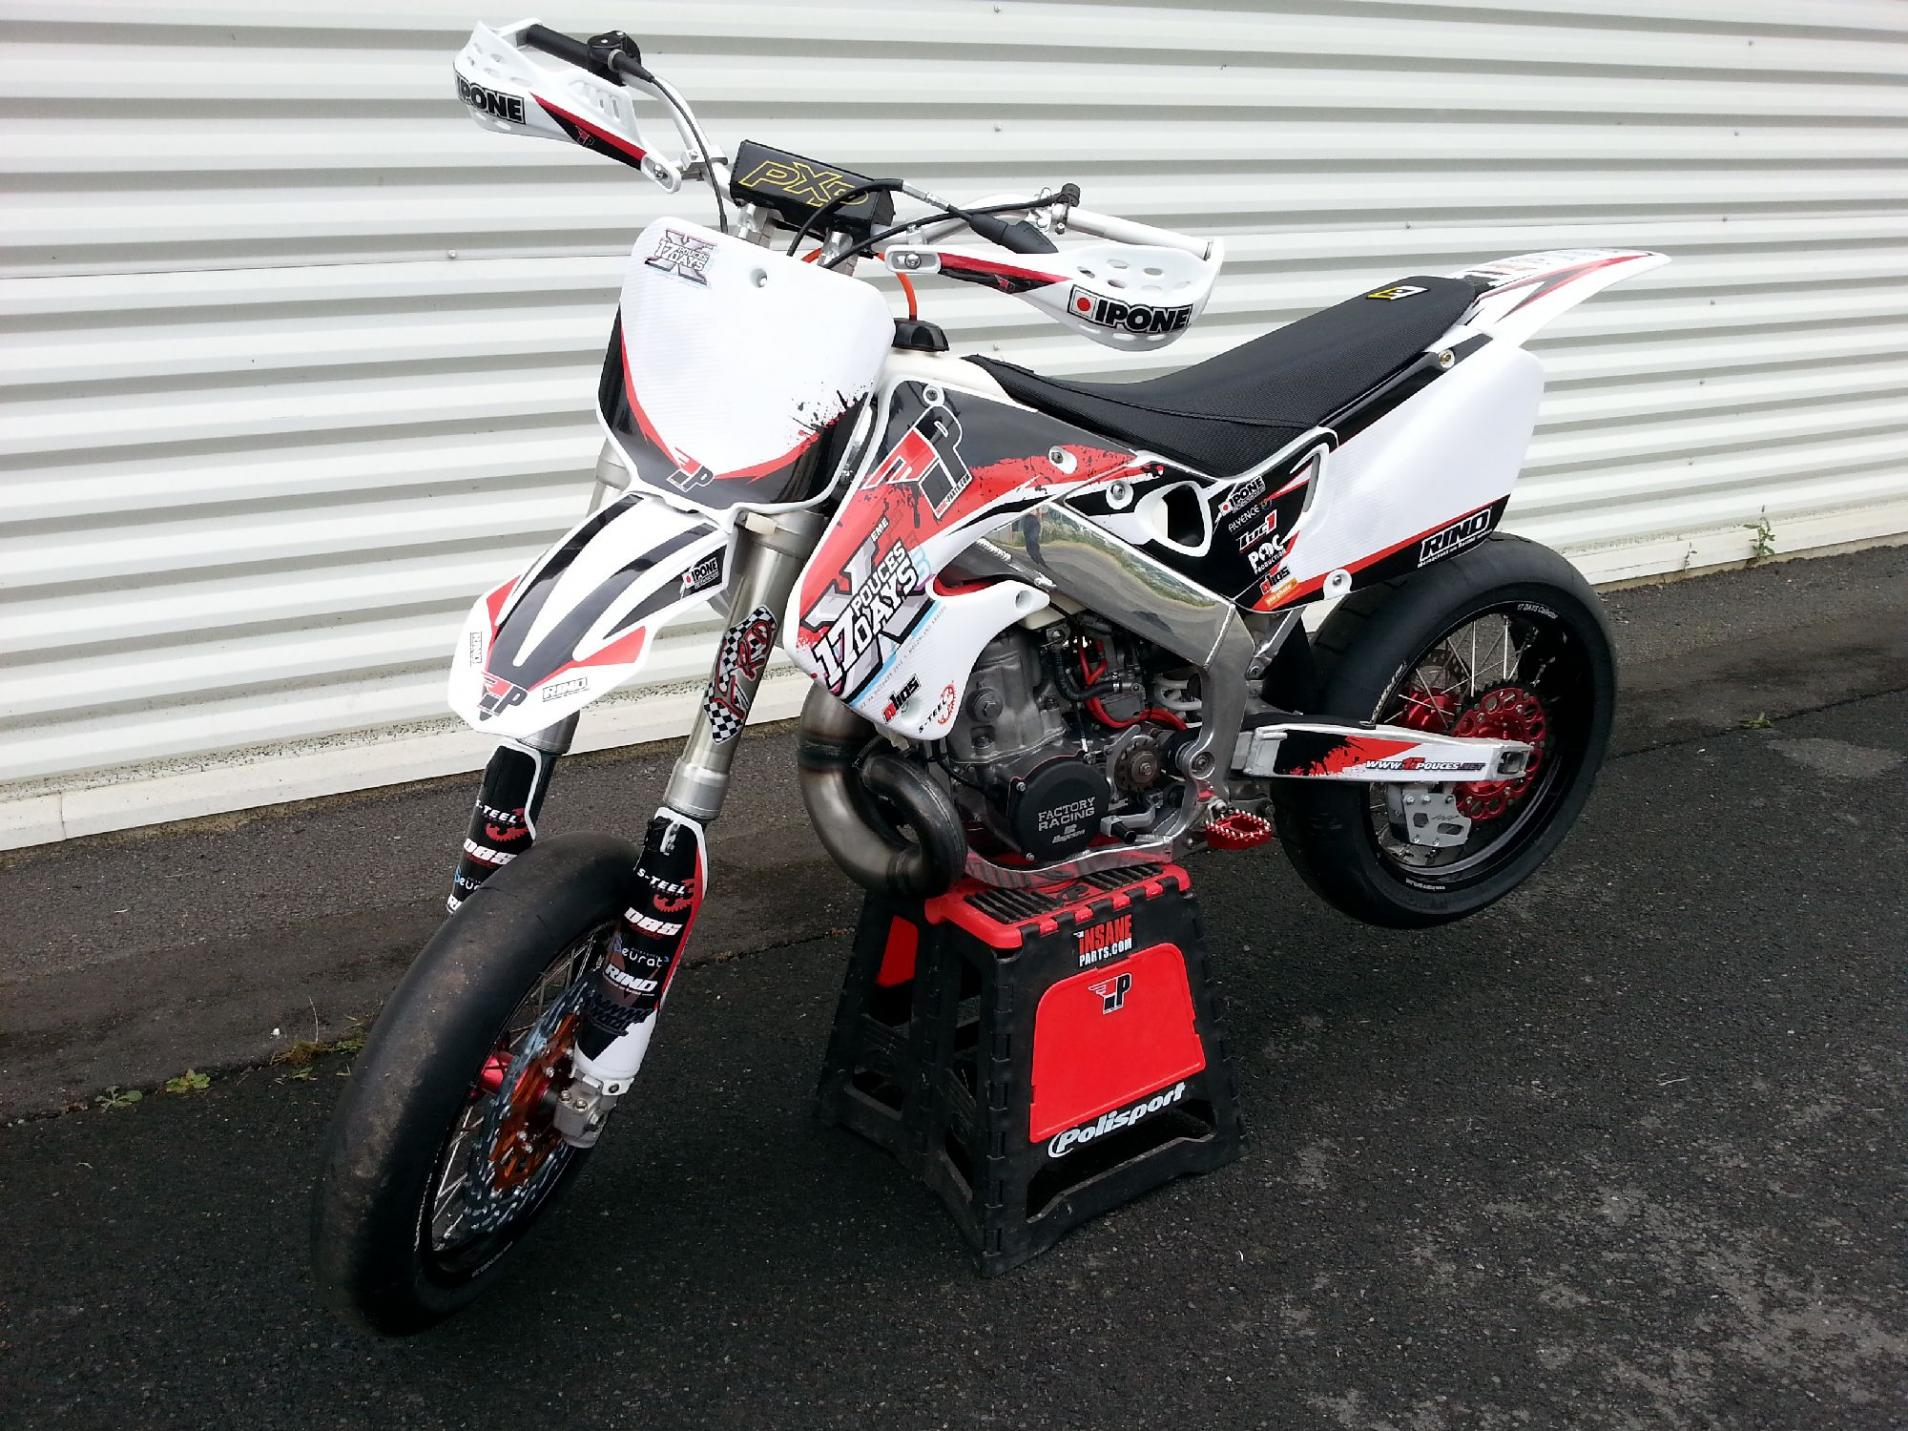 Honda-250-CR-97.jpg.3115f3eef32cb5f8b7ab